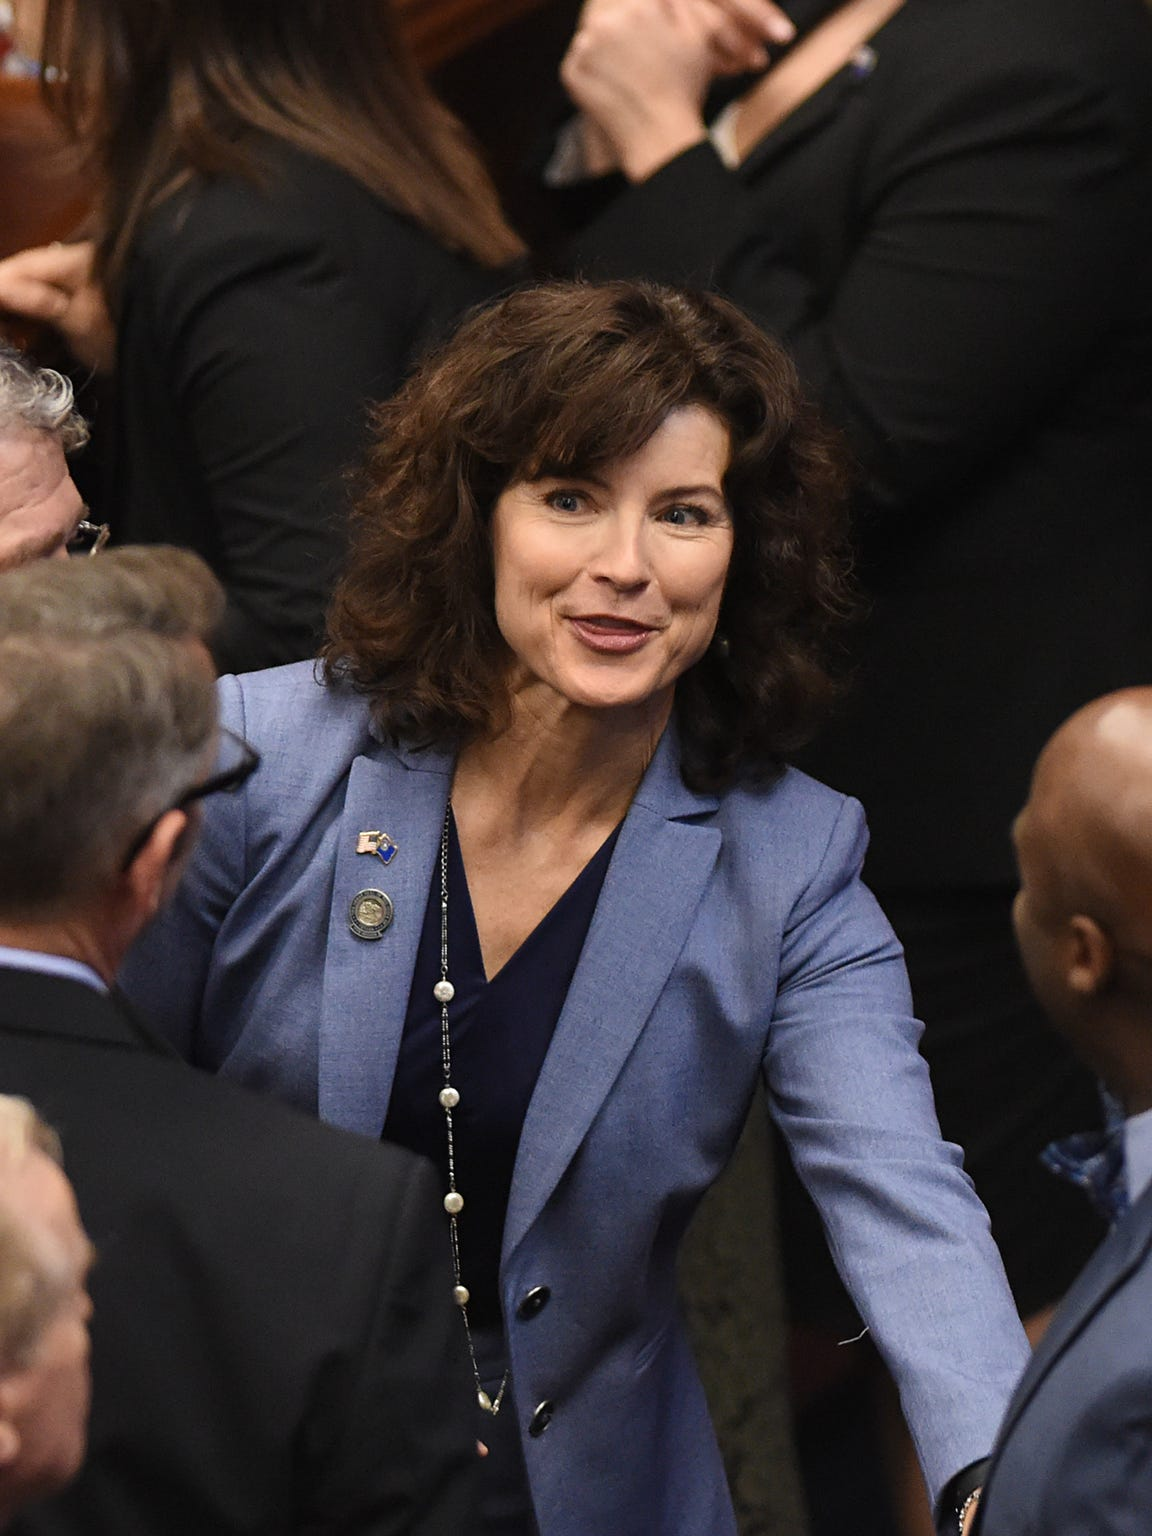 Senator Heidi Gansert walks the senate chambers as the 79th Session of the Nevada Legislature gets underway Feb. 6.